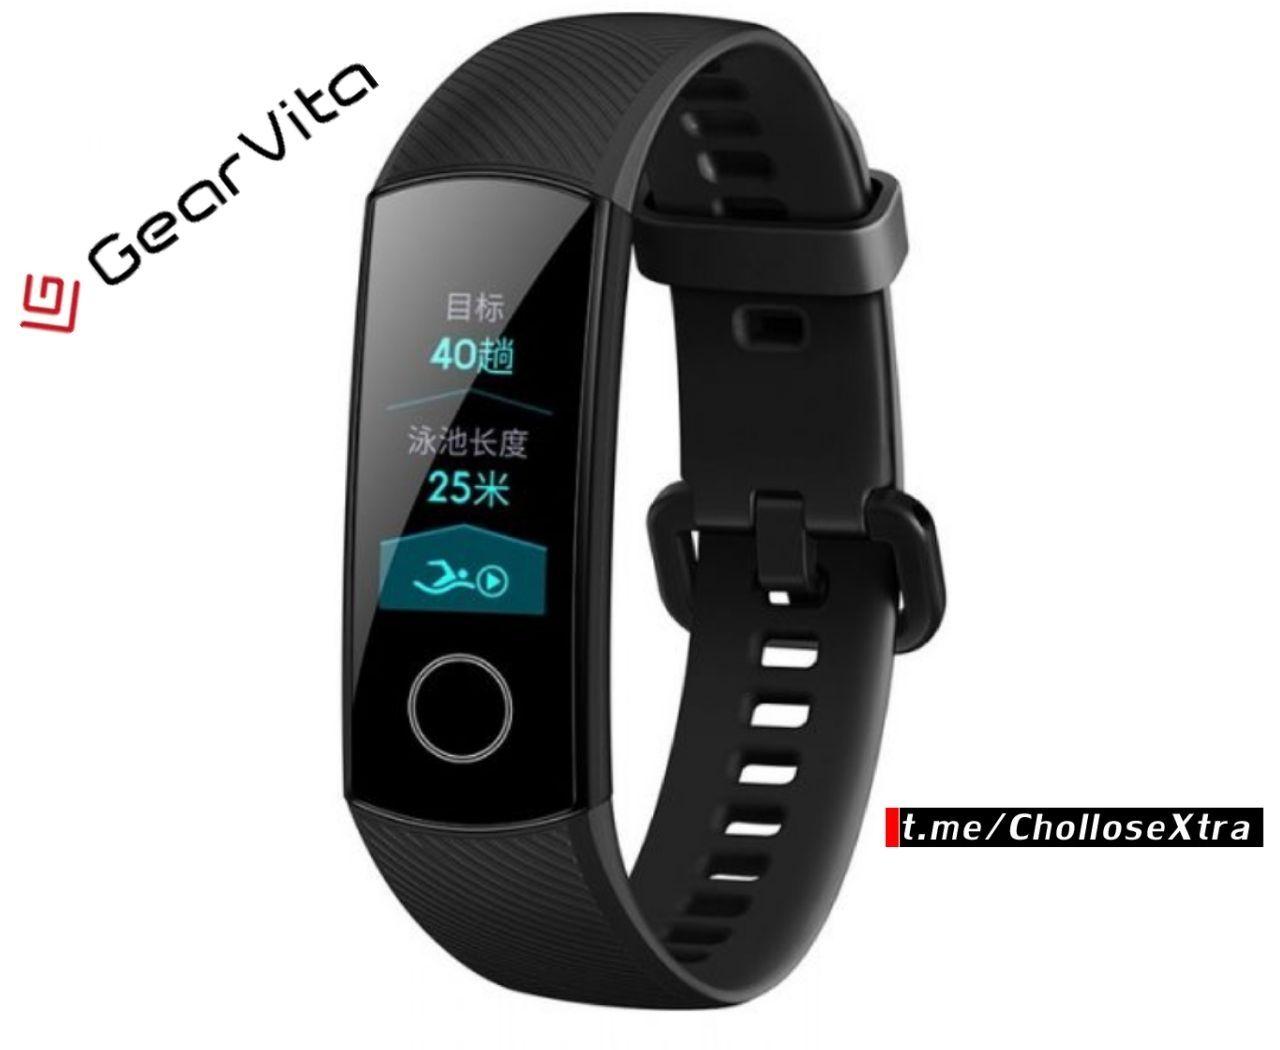 Huawei Honor Band 4 Smart Wristband